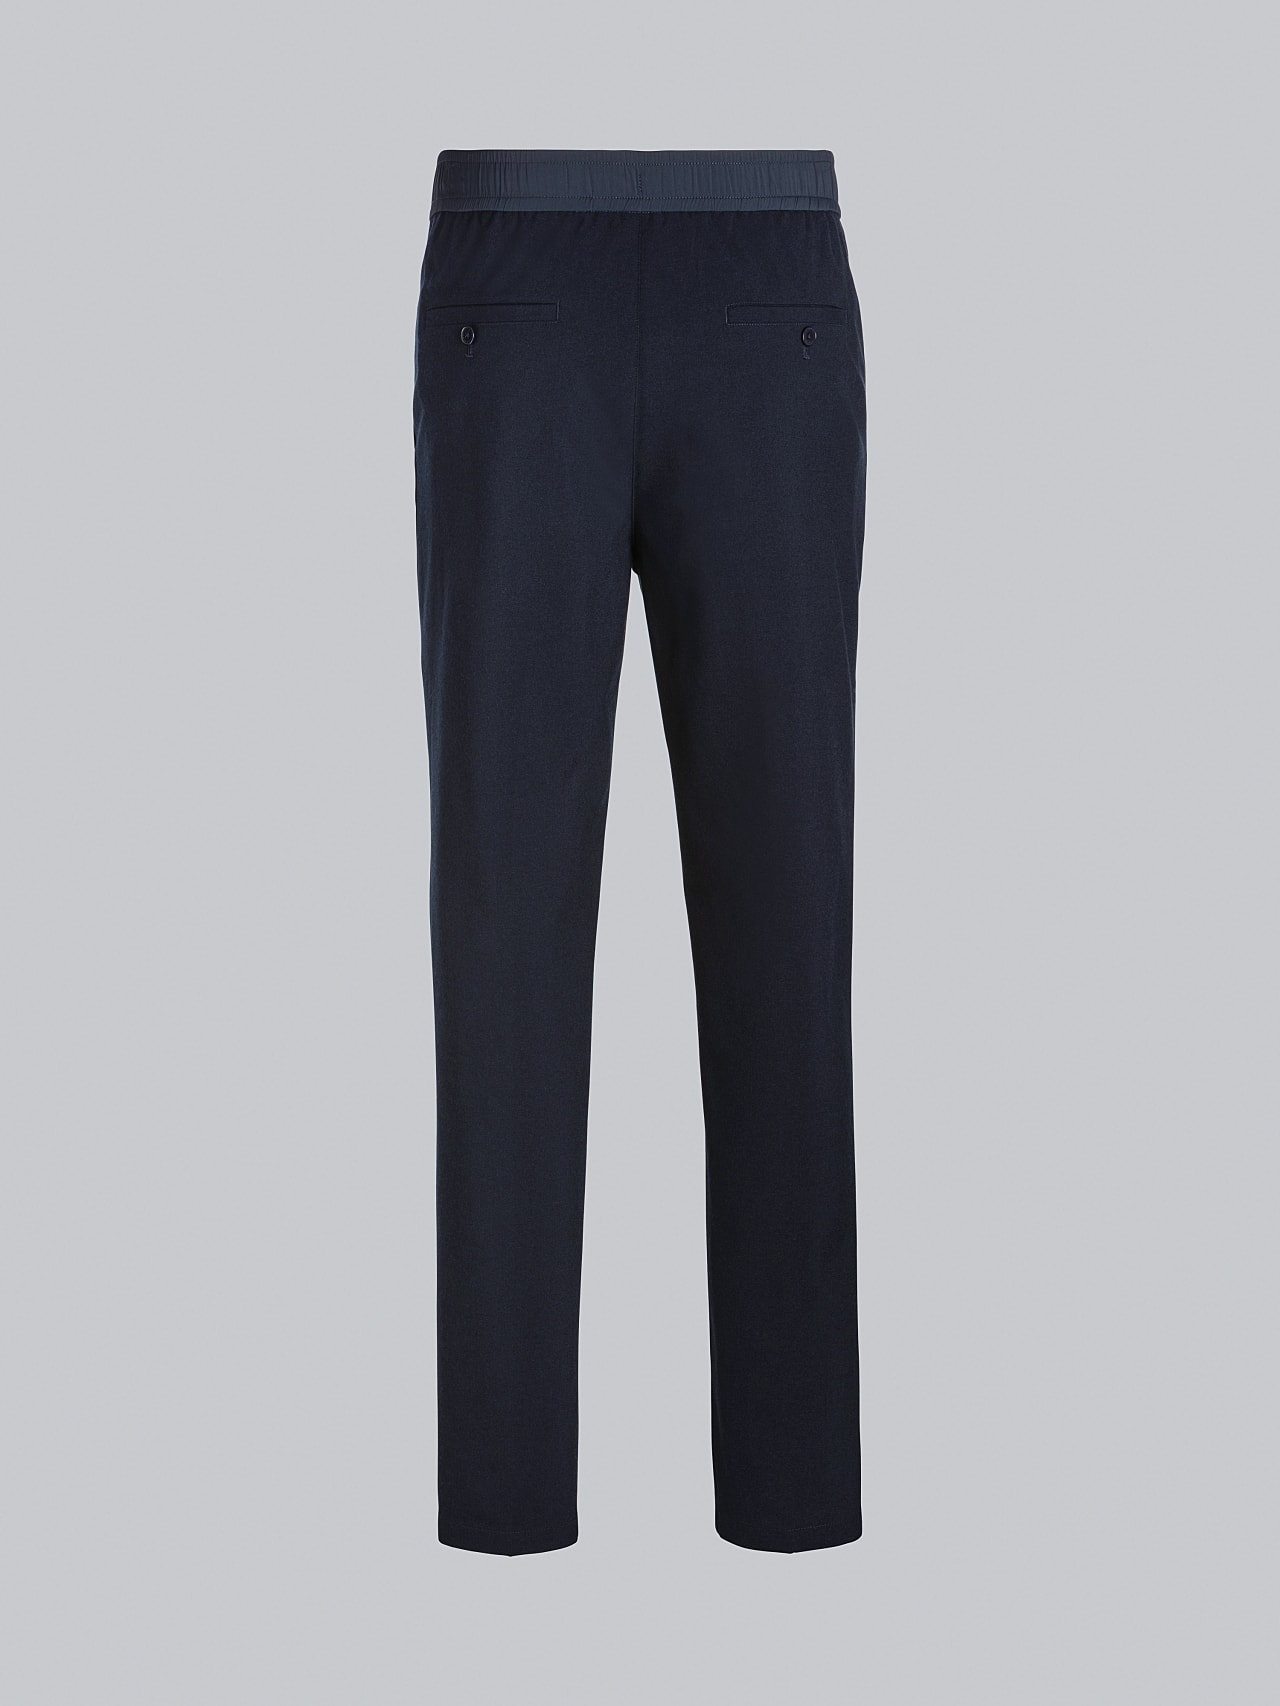 PANZA V1.Y5.02 Slim Pleat Trousers navy Left Alpha Tauri